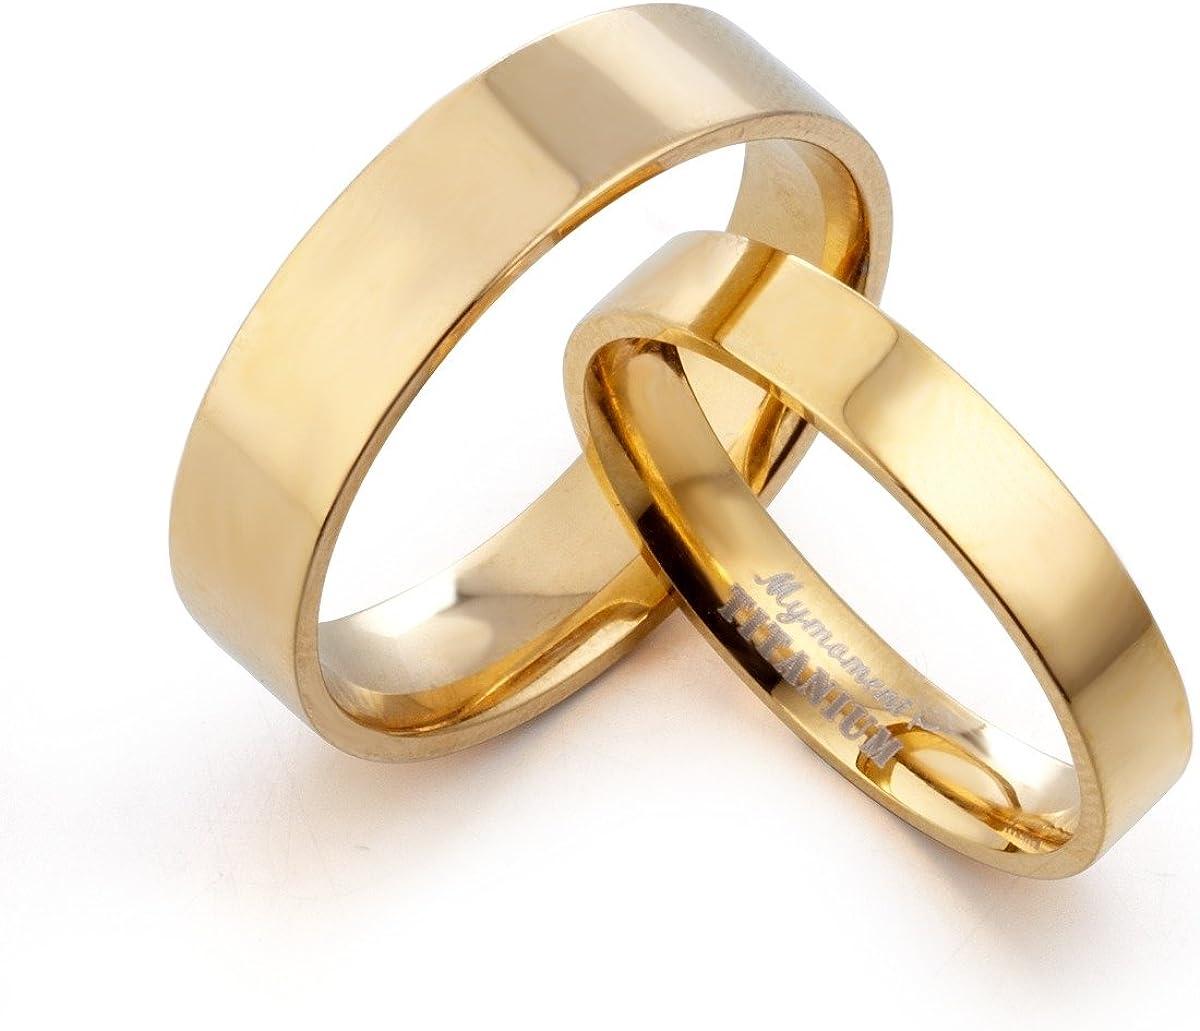 8 Women Ring Size 11 Width 6mm /& 4mm Men Ring Size Gemini Groom /& Bride Matching 18K Gold Filled Anniversary Wedding Titanium Rings Set